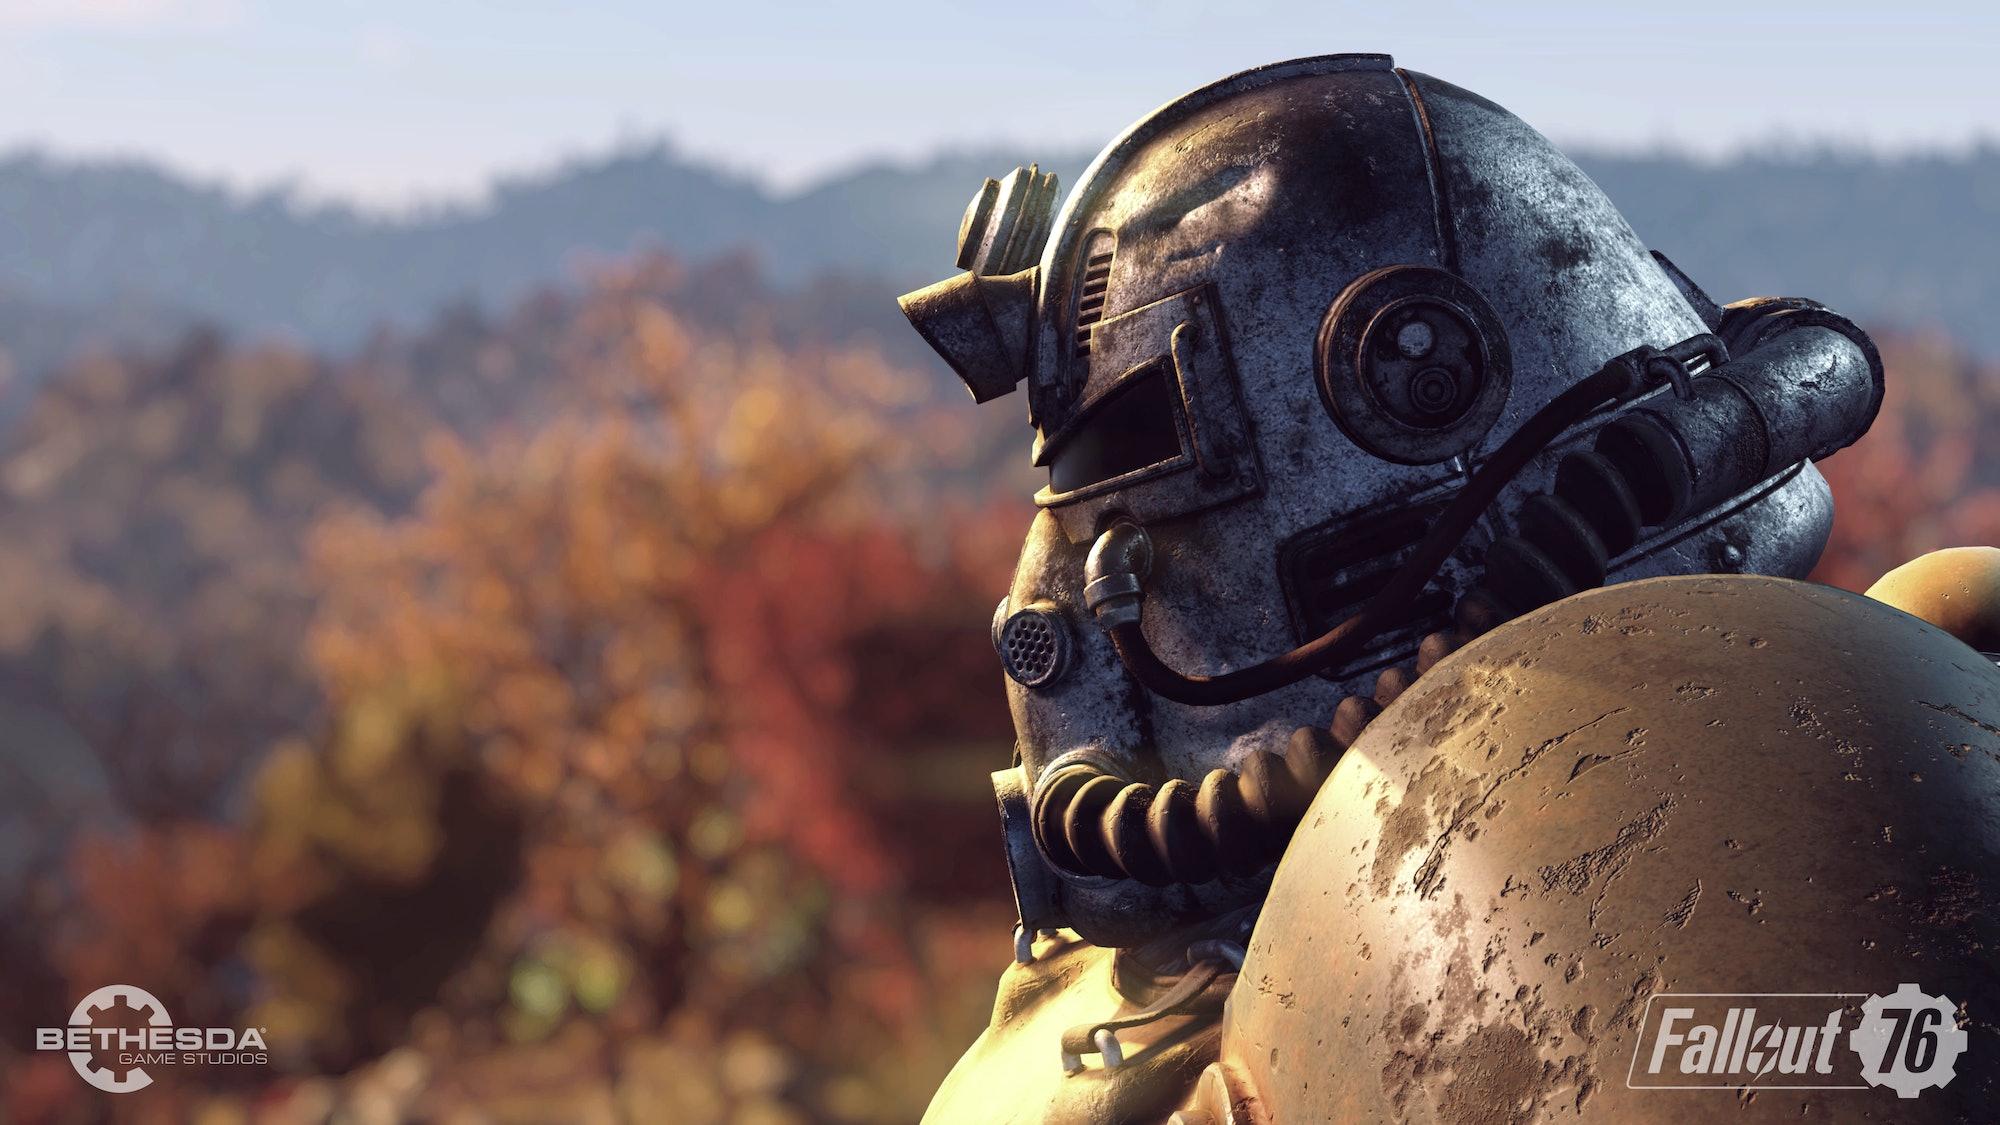 Fallout 76 Power Armor helmet